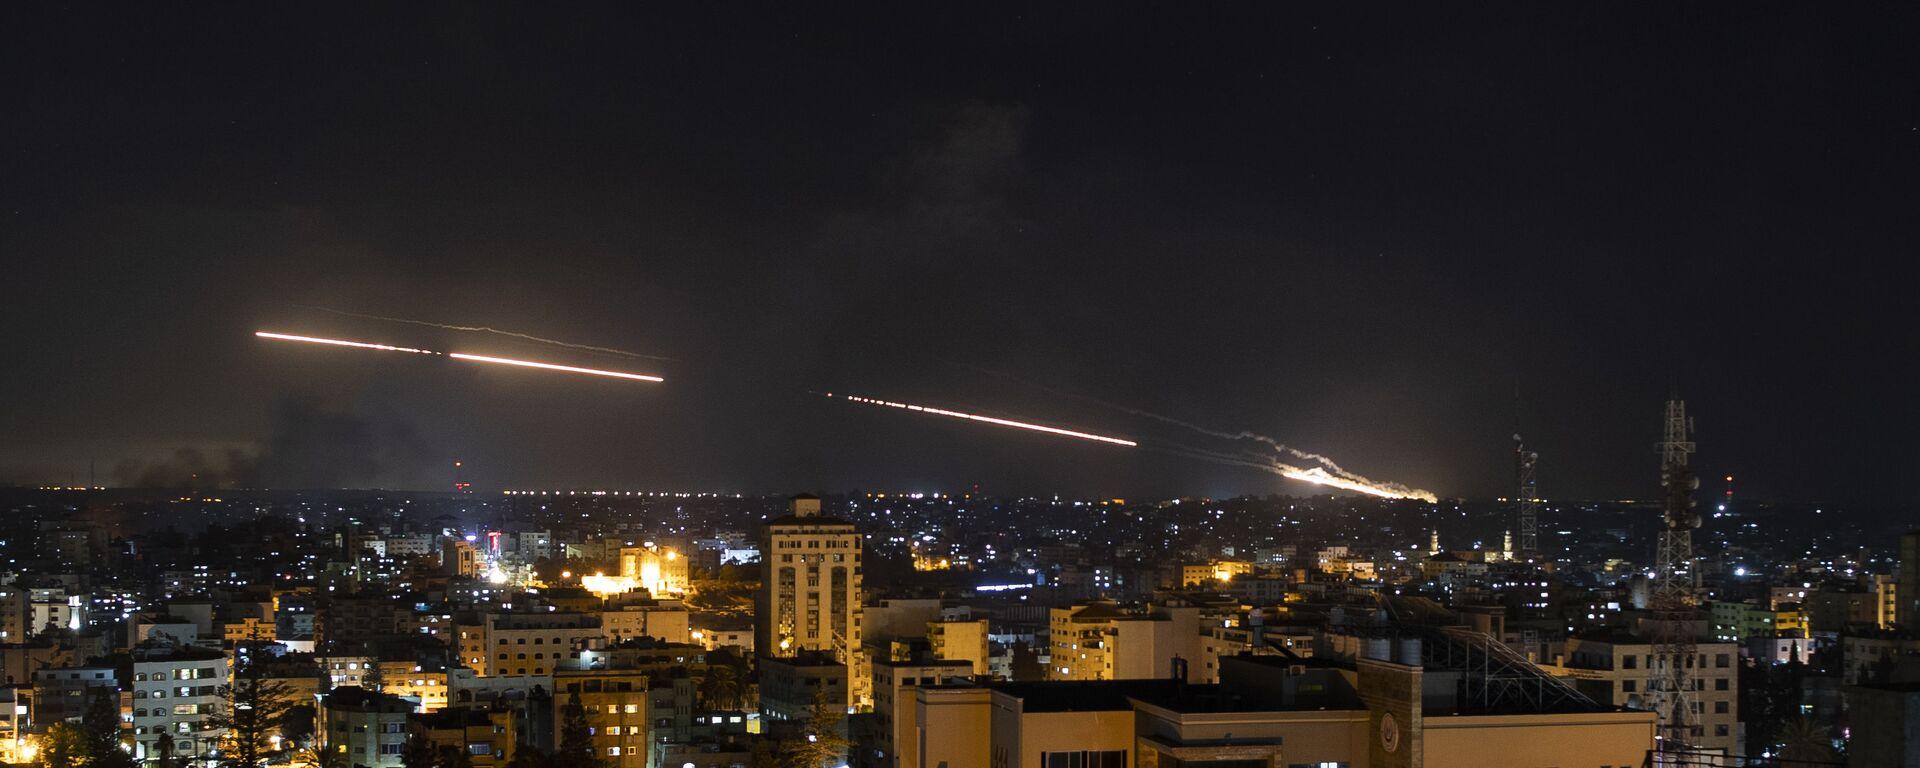 Rakety vypuštěné z Pásma Gazy na Izrael - Sputnik Česká republika, 1920, 15.05.2021